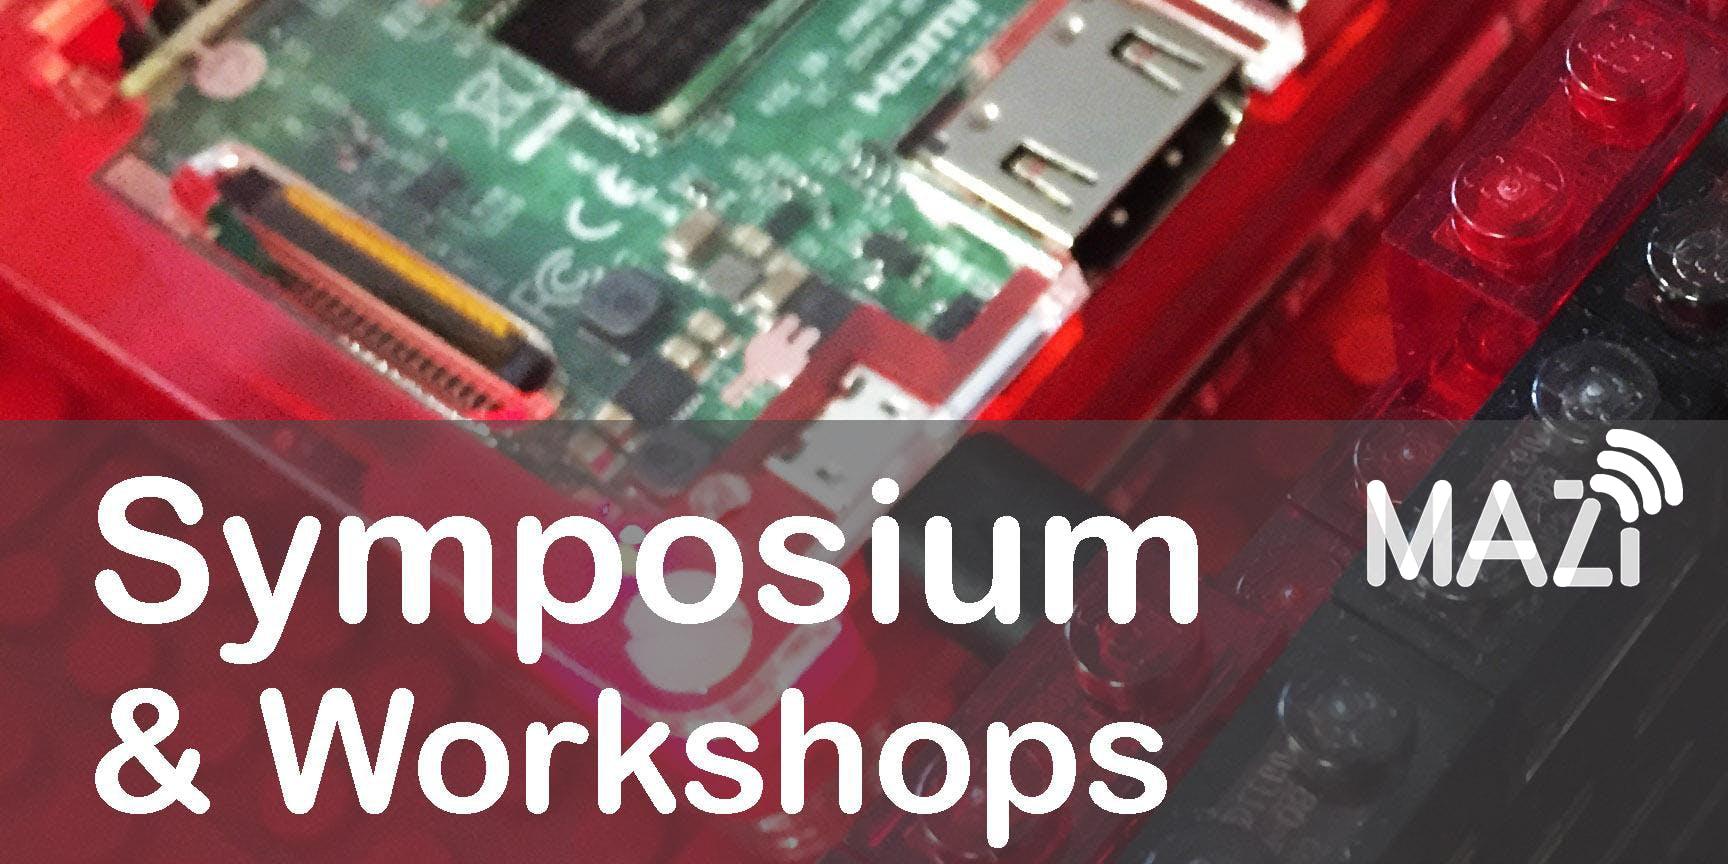 Workshop 1: Customising the MAZI Toolkit